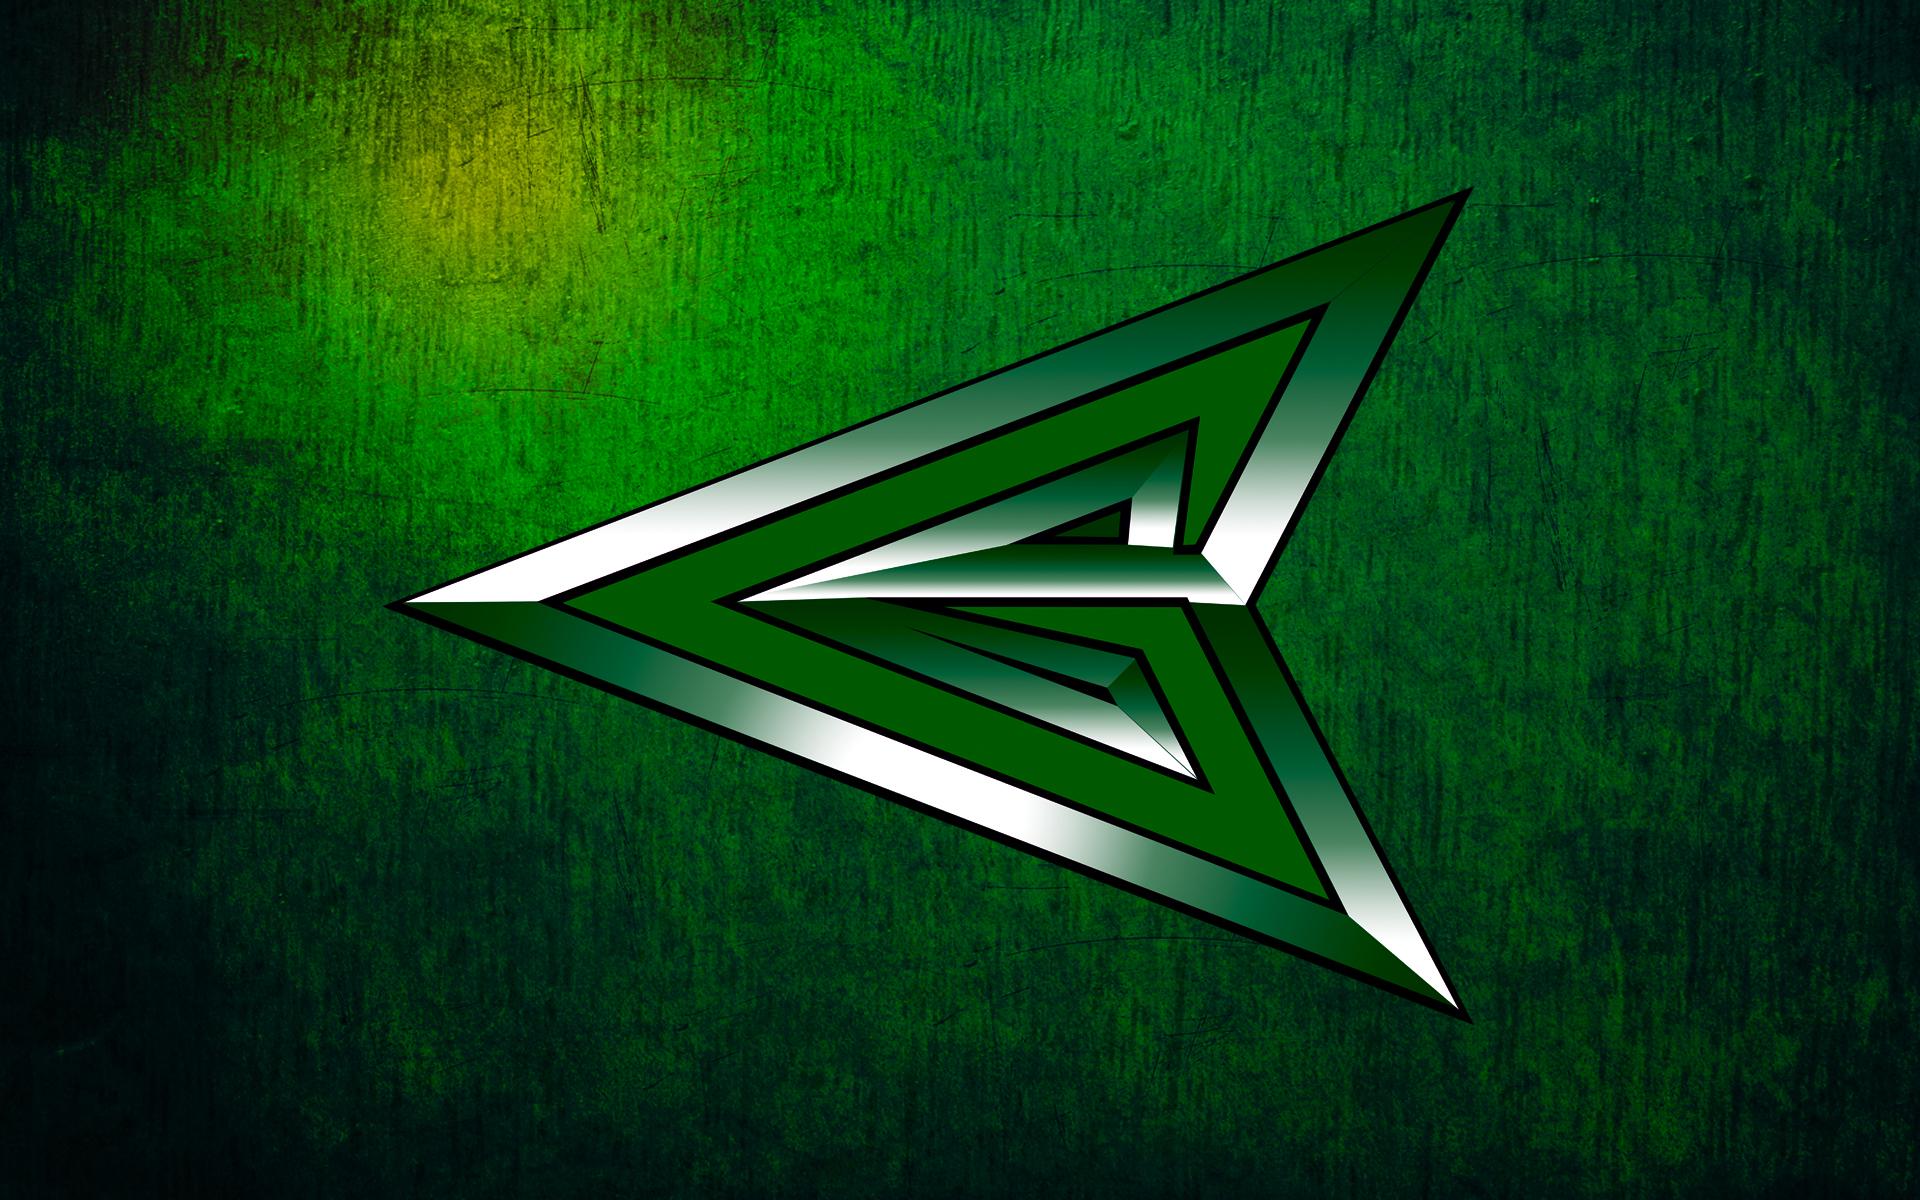 Green Arrow Computer Wallpapers Desktop Backgrounds 1920x1200 ID 1920x1200